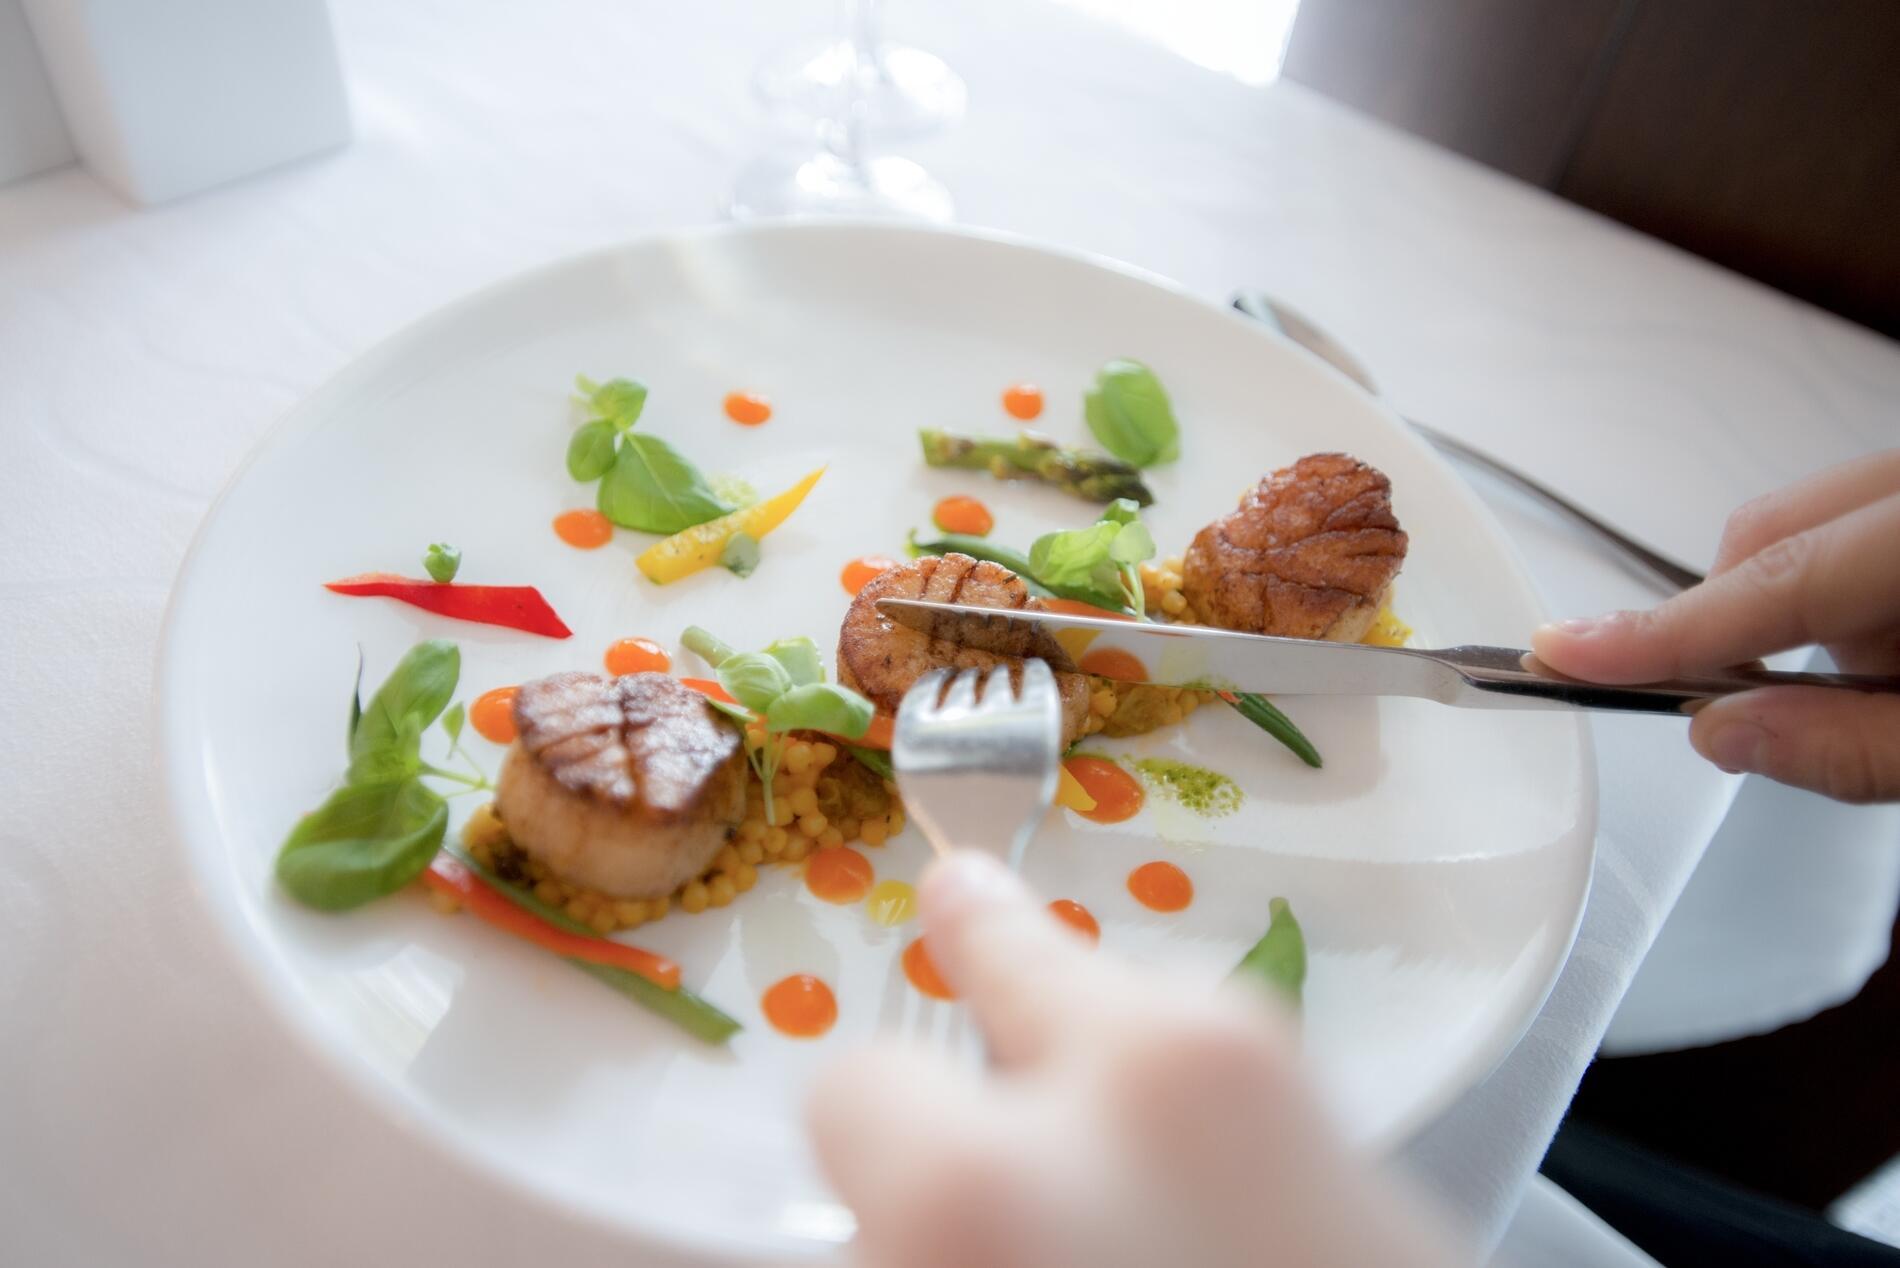 Guest cutting plate of seared scallops